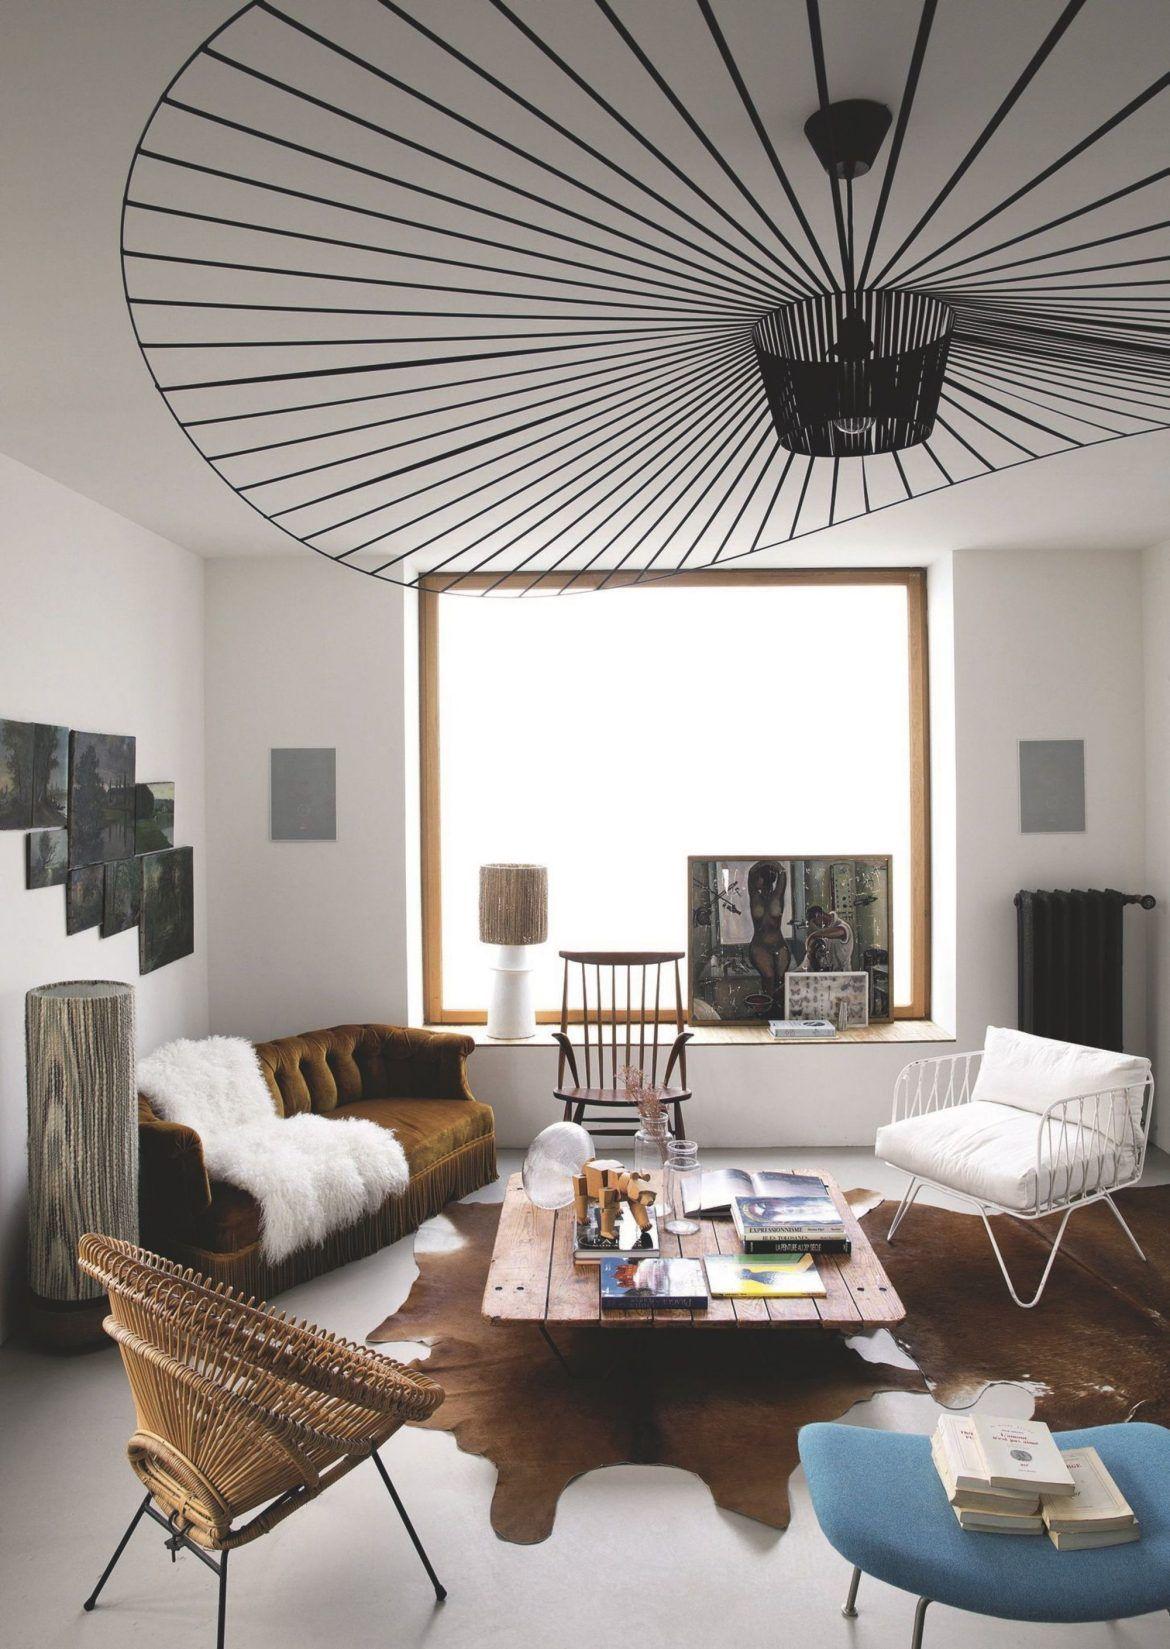 la suspension vertigo objet design d j culte obsession vertigo pinterest suspension. Black Bedroom Furniture Sets. Home Design Ideas